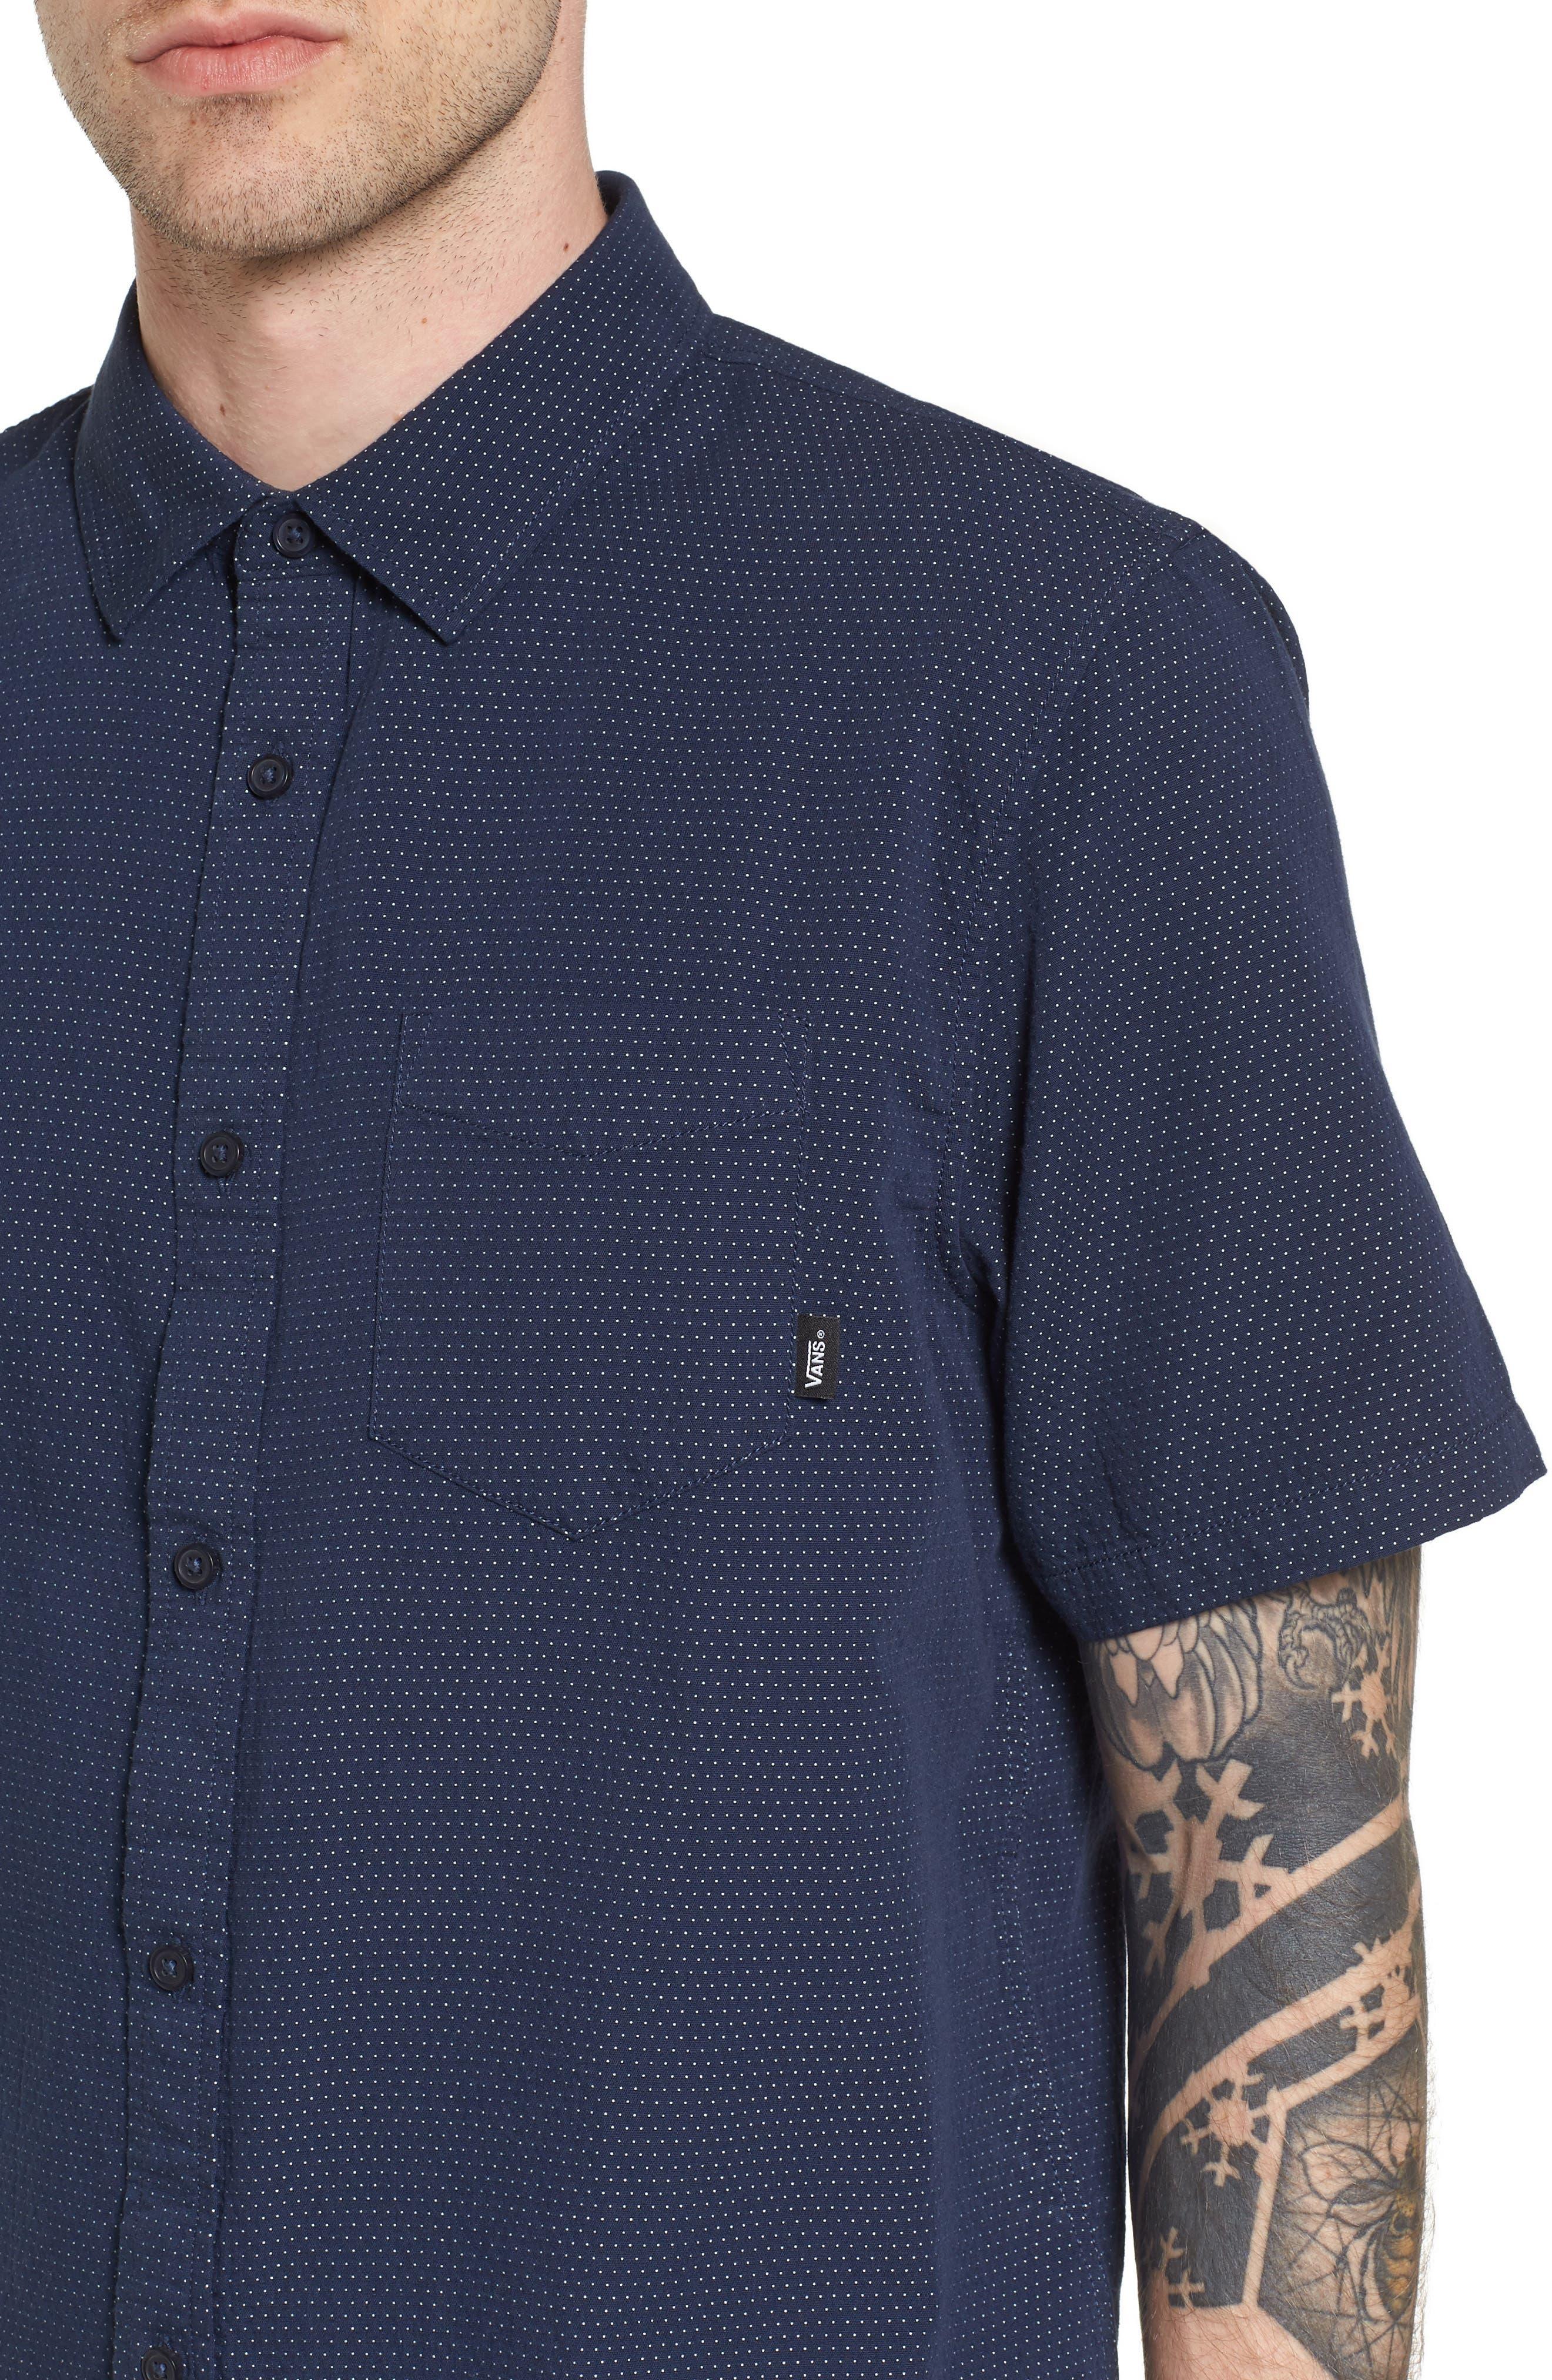 Giddings Short Sleeve Shirt,                             Alternate thumbnail 4, color,                             Dress Blues